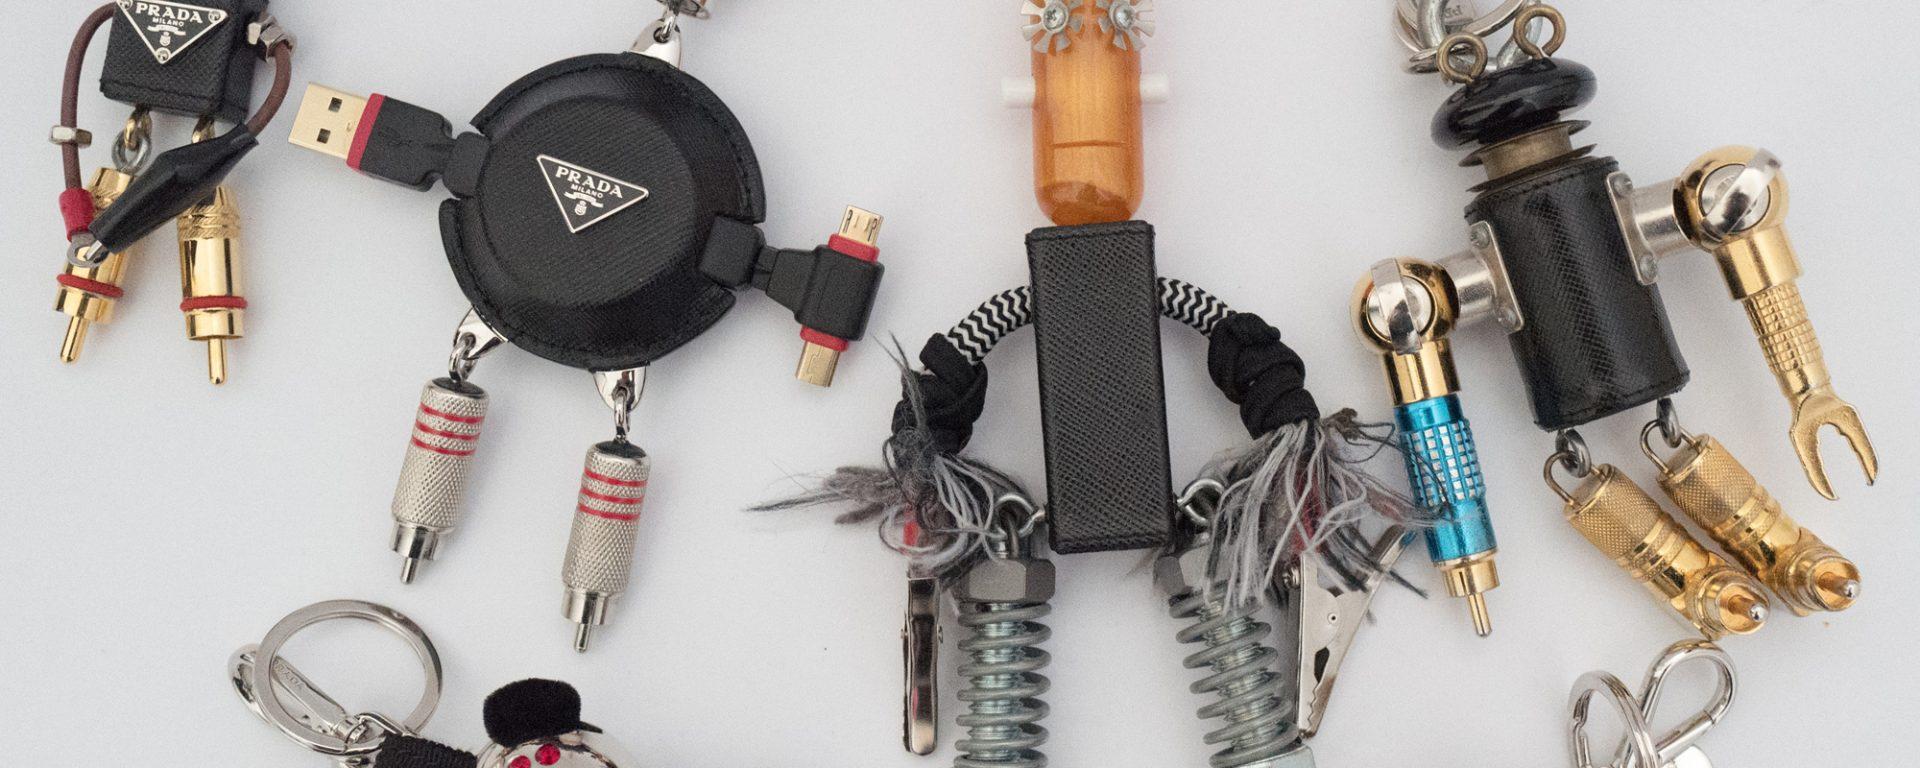 Prada Robin Robot Trick Key Chain BCdkpa6EQ